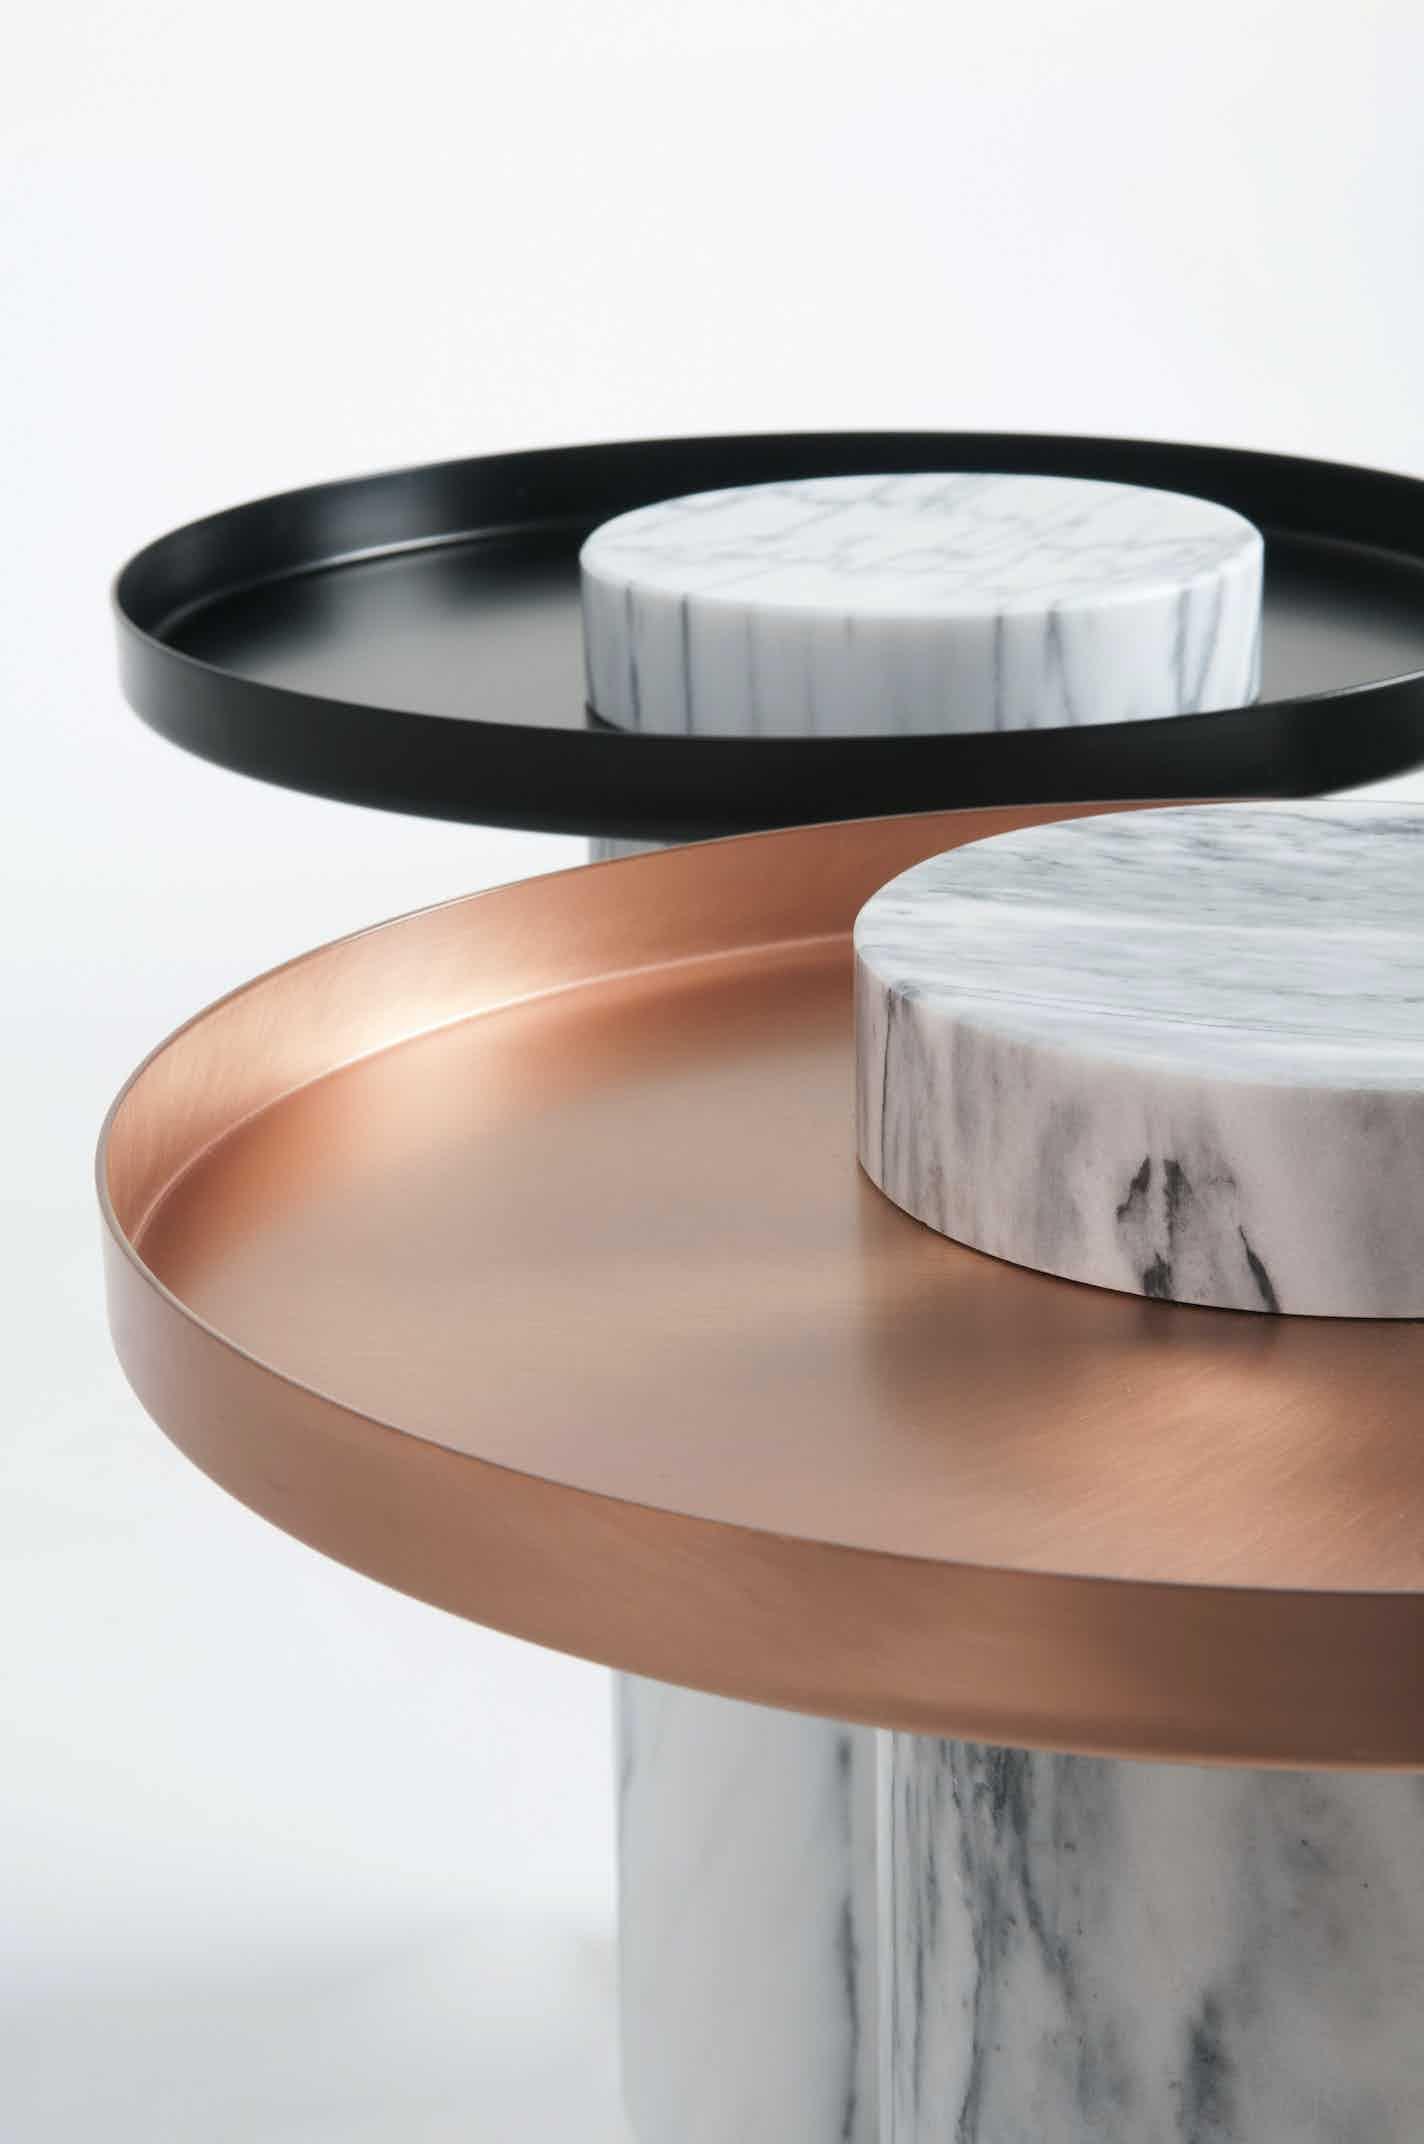 La-chance-furniture-salute-table-detail-haute-living